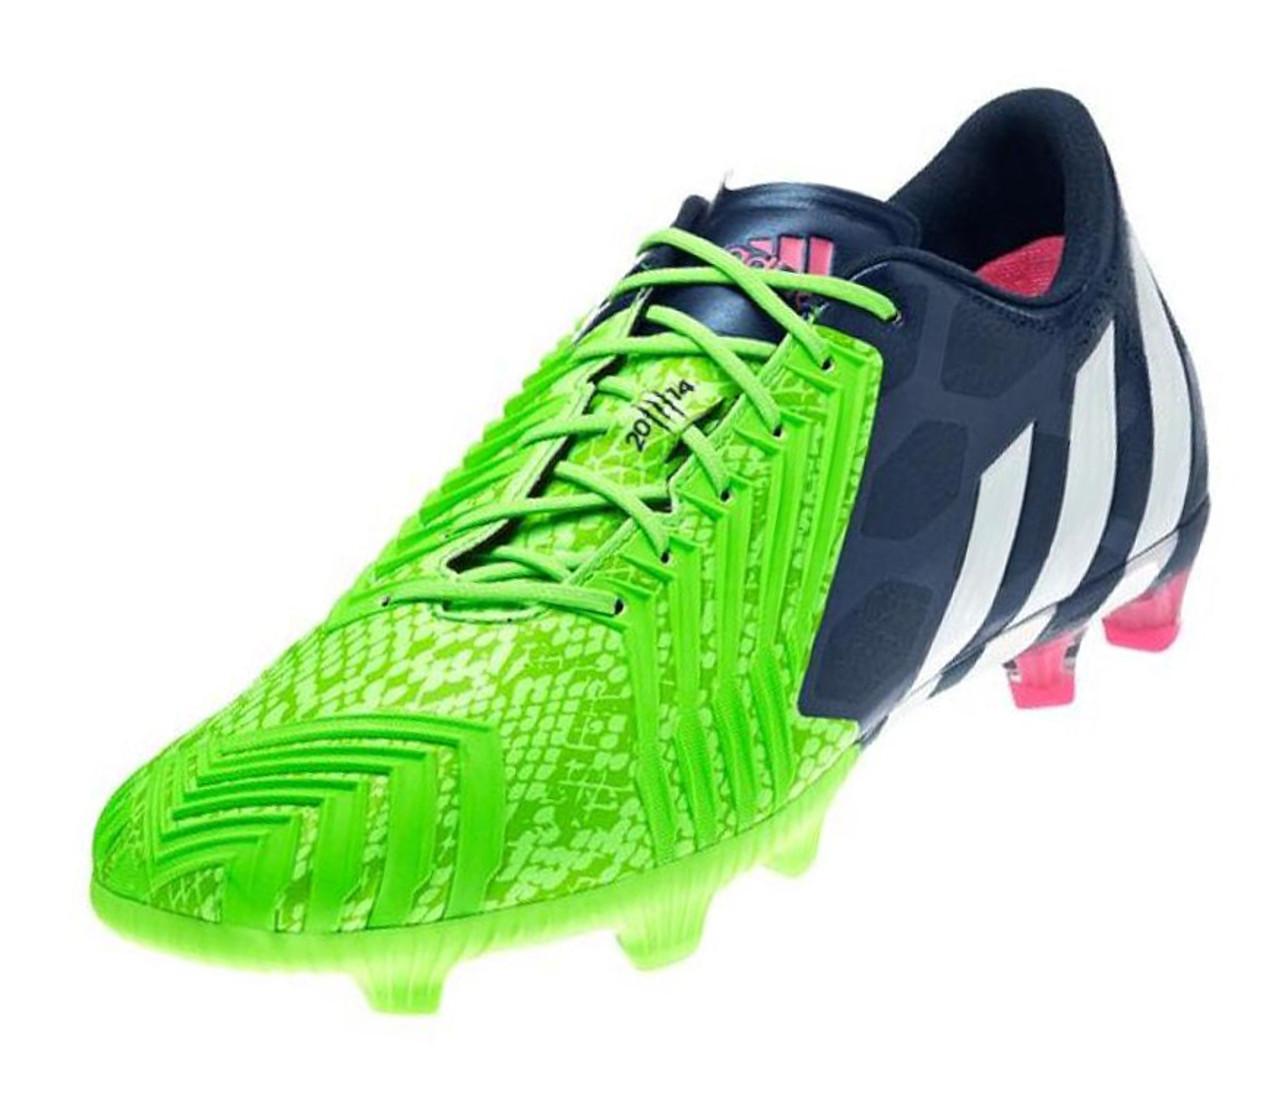 9f61b997ac2c adidas Predator Instinct FG - Green Black RC (122217) - ohp soccer